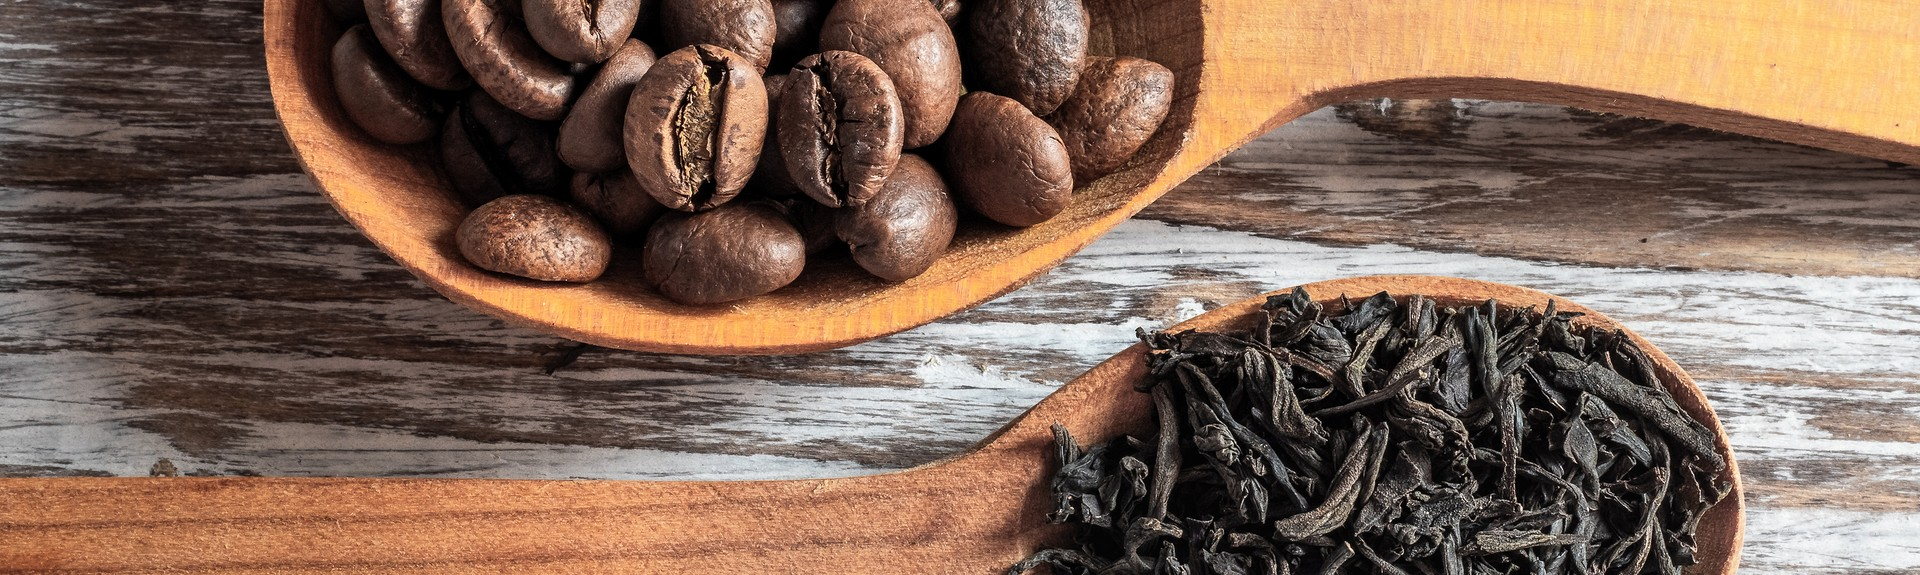 Thés et cafés bio en vrac